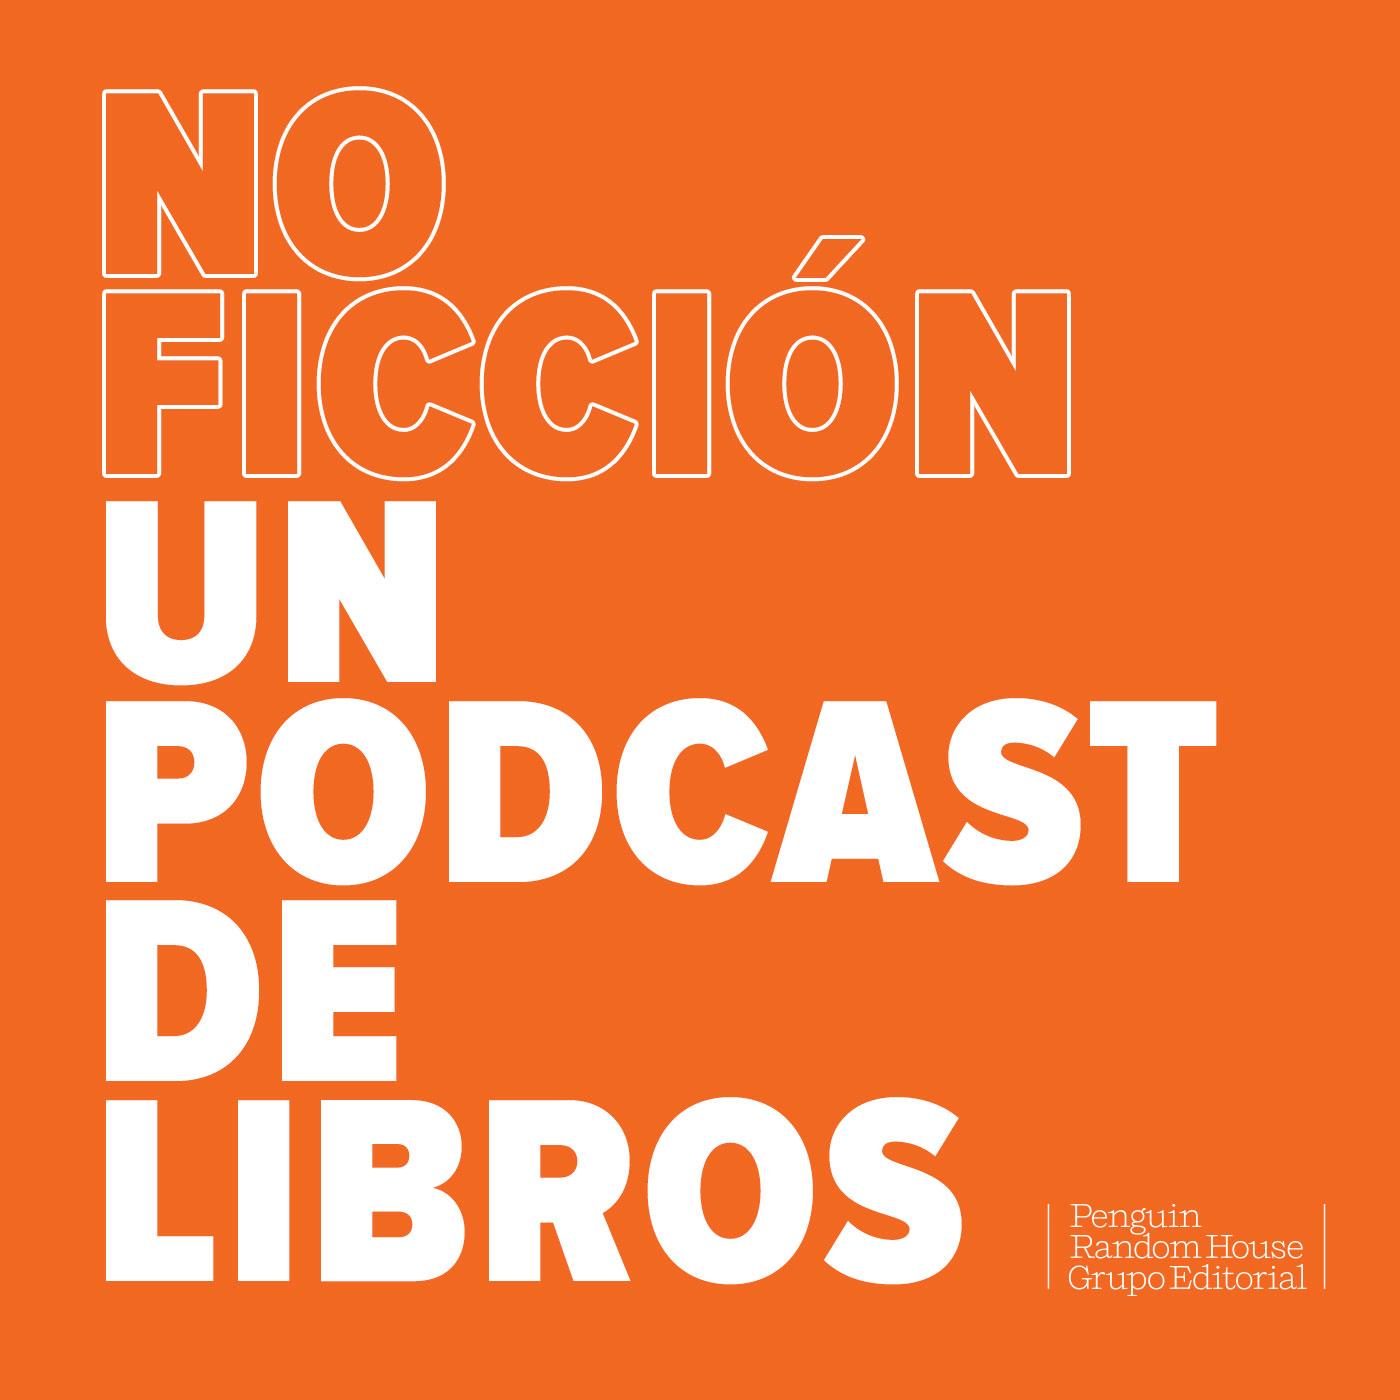 No ficción | Un podcast de libros show art